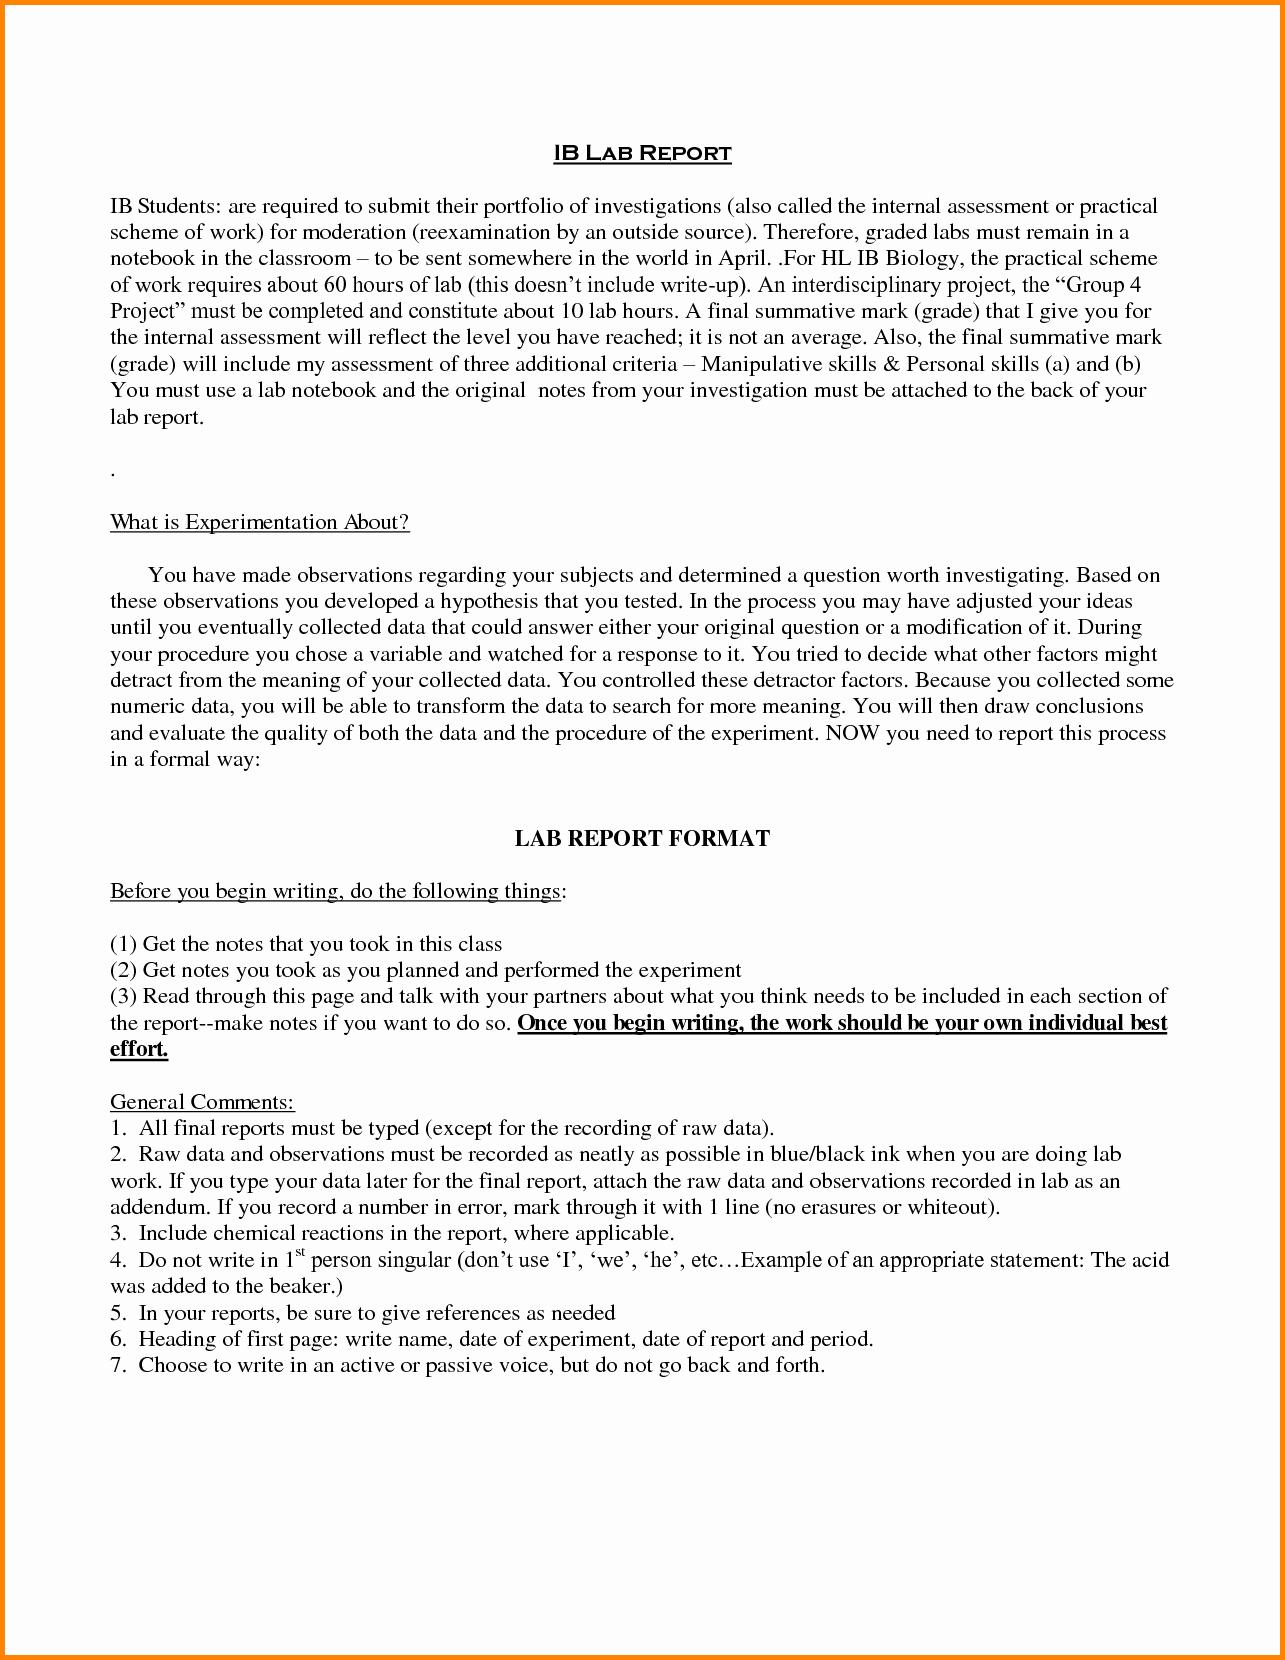 Incident Statement Letter Sample Unique Sample Report Letter to Management